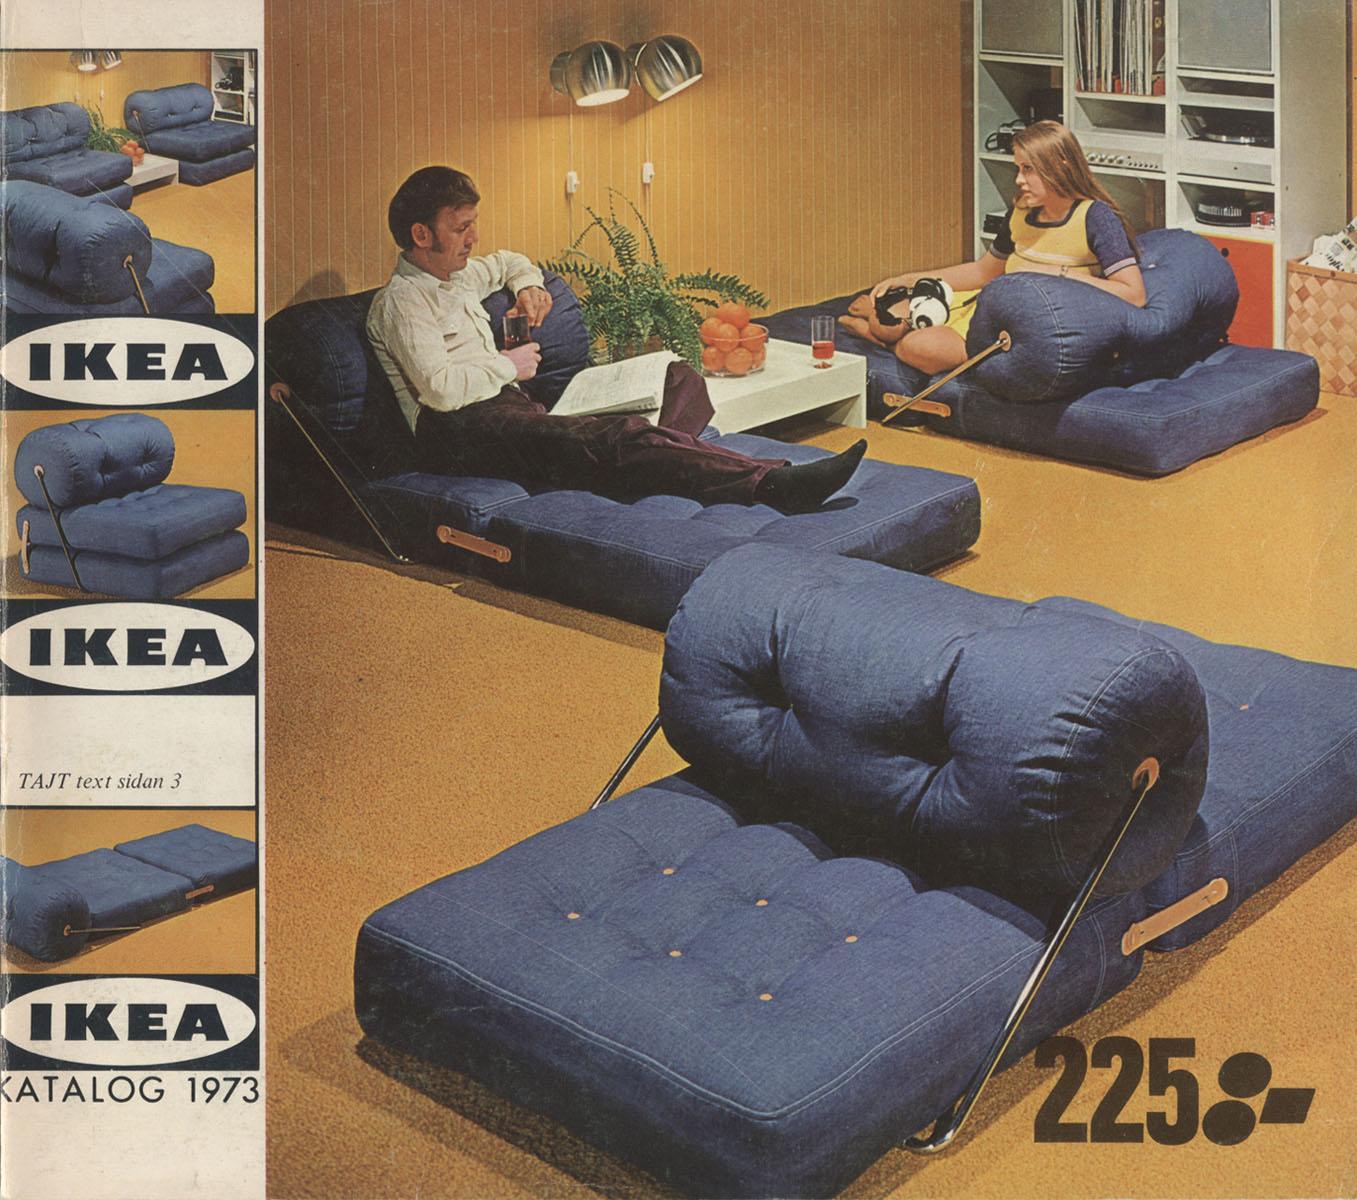 Ikea 1973 Catalog Interior Design Ideas